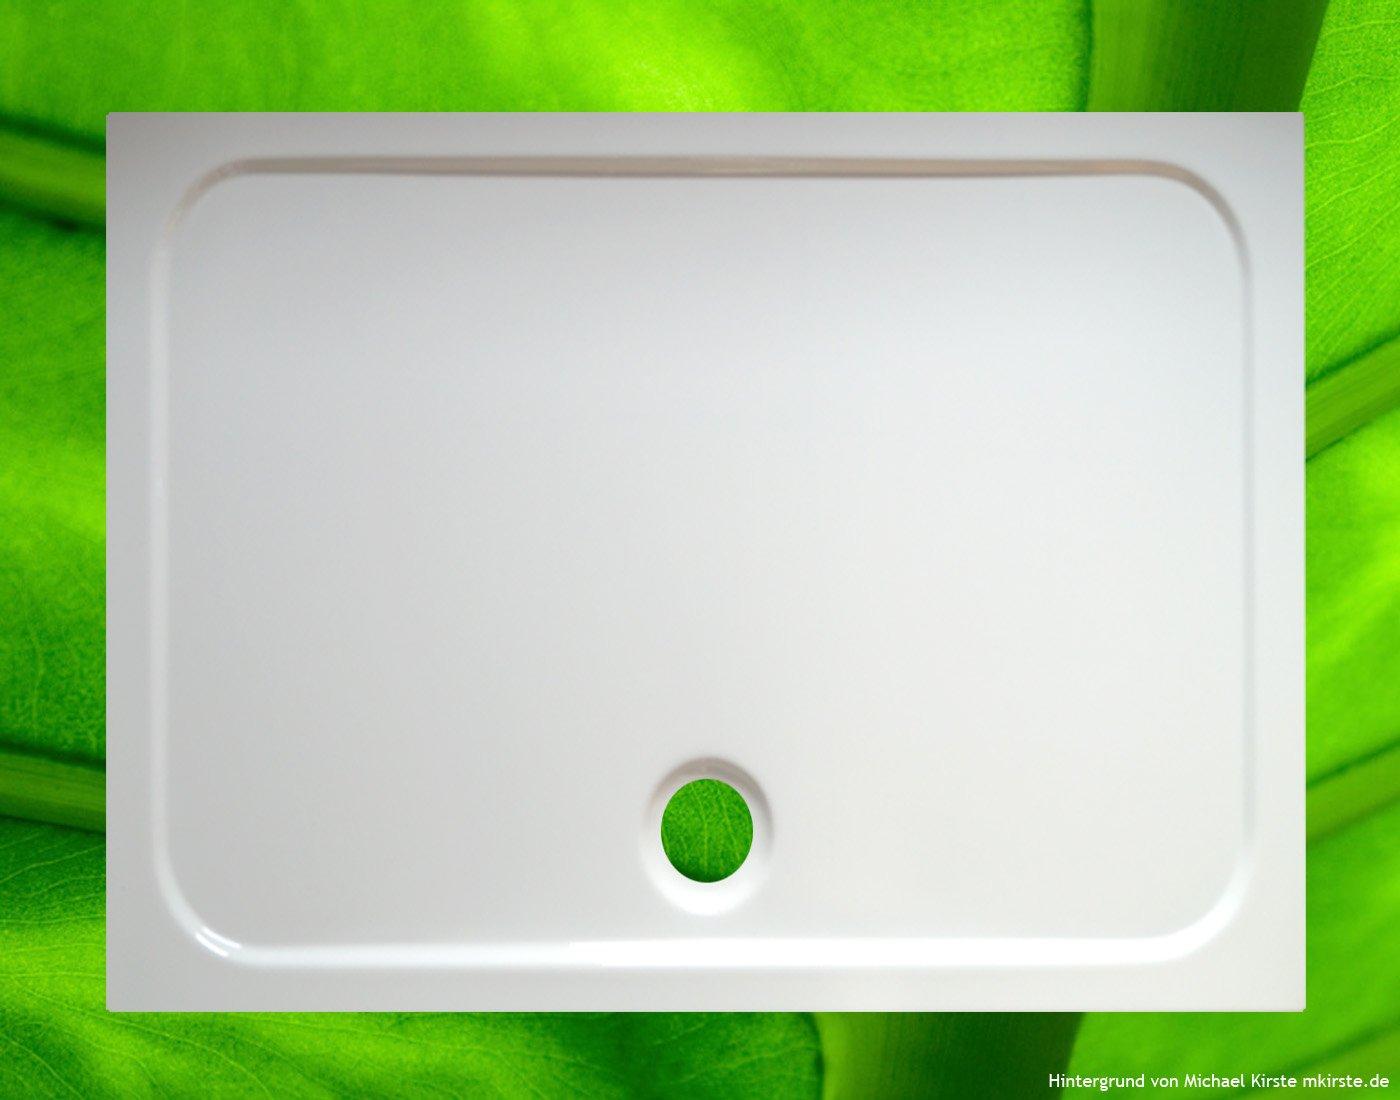 Bodengleiche duschwanne 90x120  Duschwanne 120x90 Duschwannen 90x120 Rechteck Duschbadewanne ...